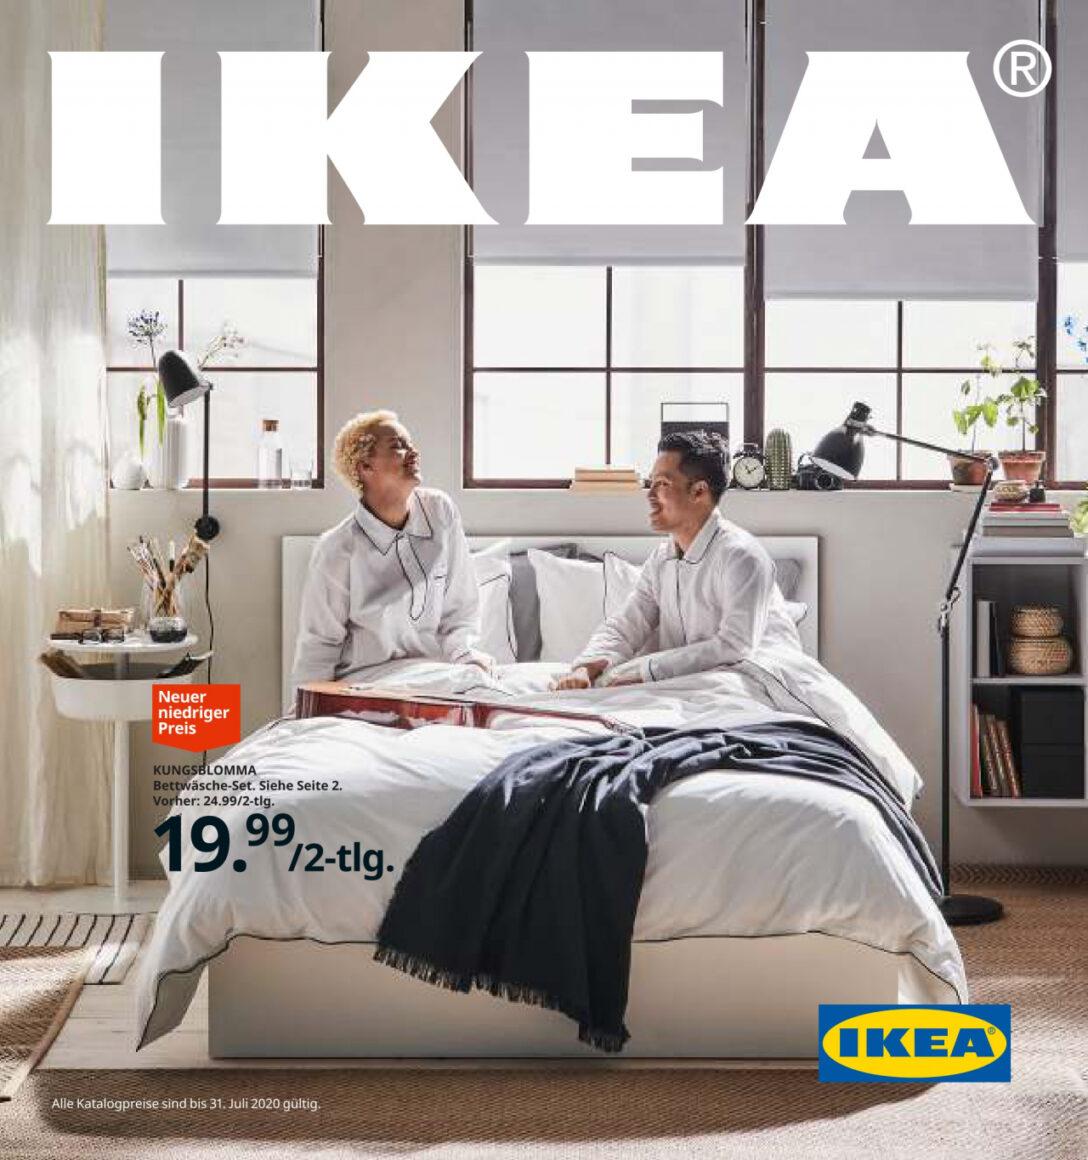 Large Size of Ikea Katalog Angebotsware 27 08 2019 31 07 2020 Kupinode Bauhaus Fenster Spüle Küche Wohnzimmer Stöpsel Spüle Bauhaus